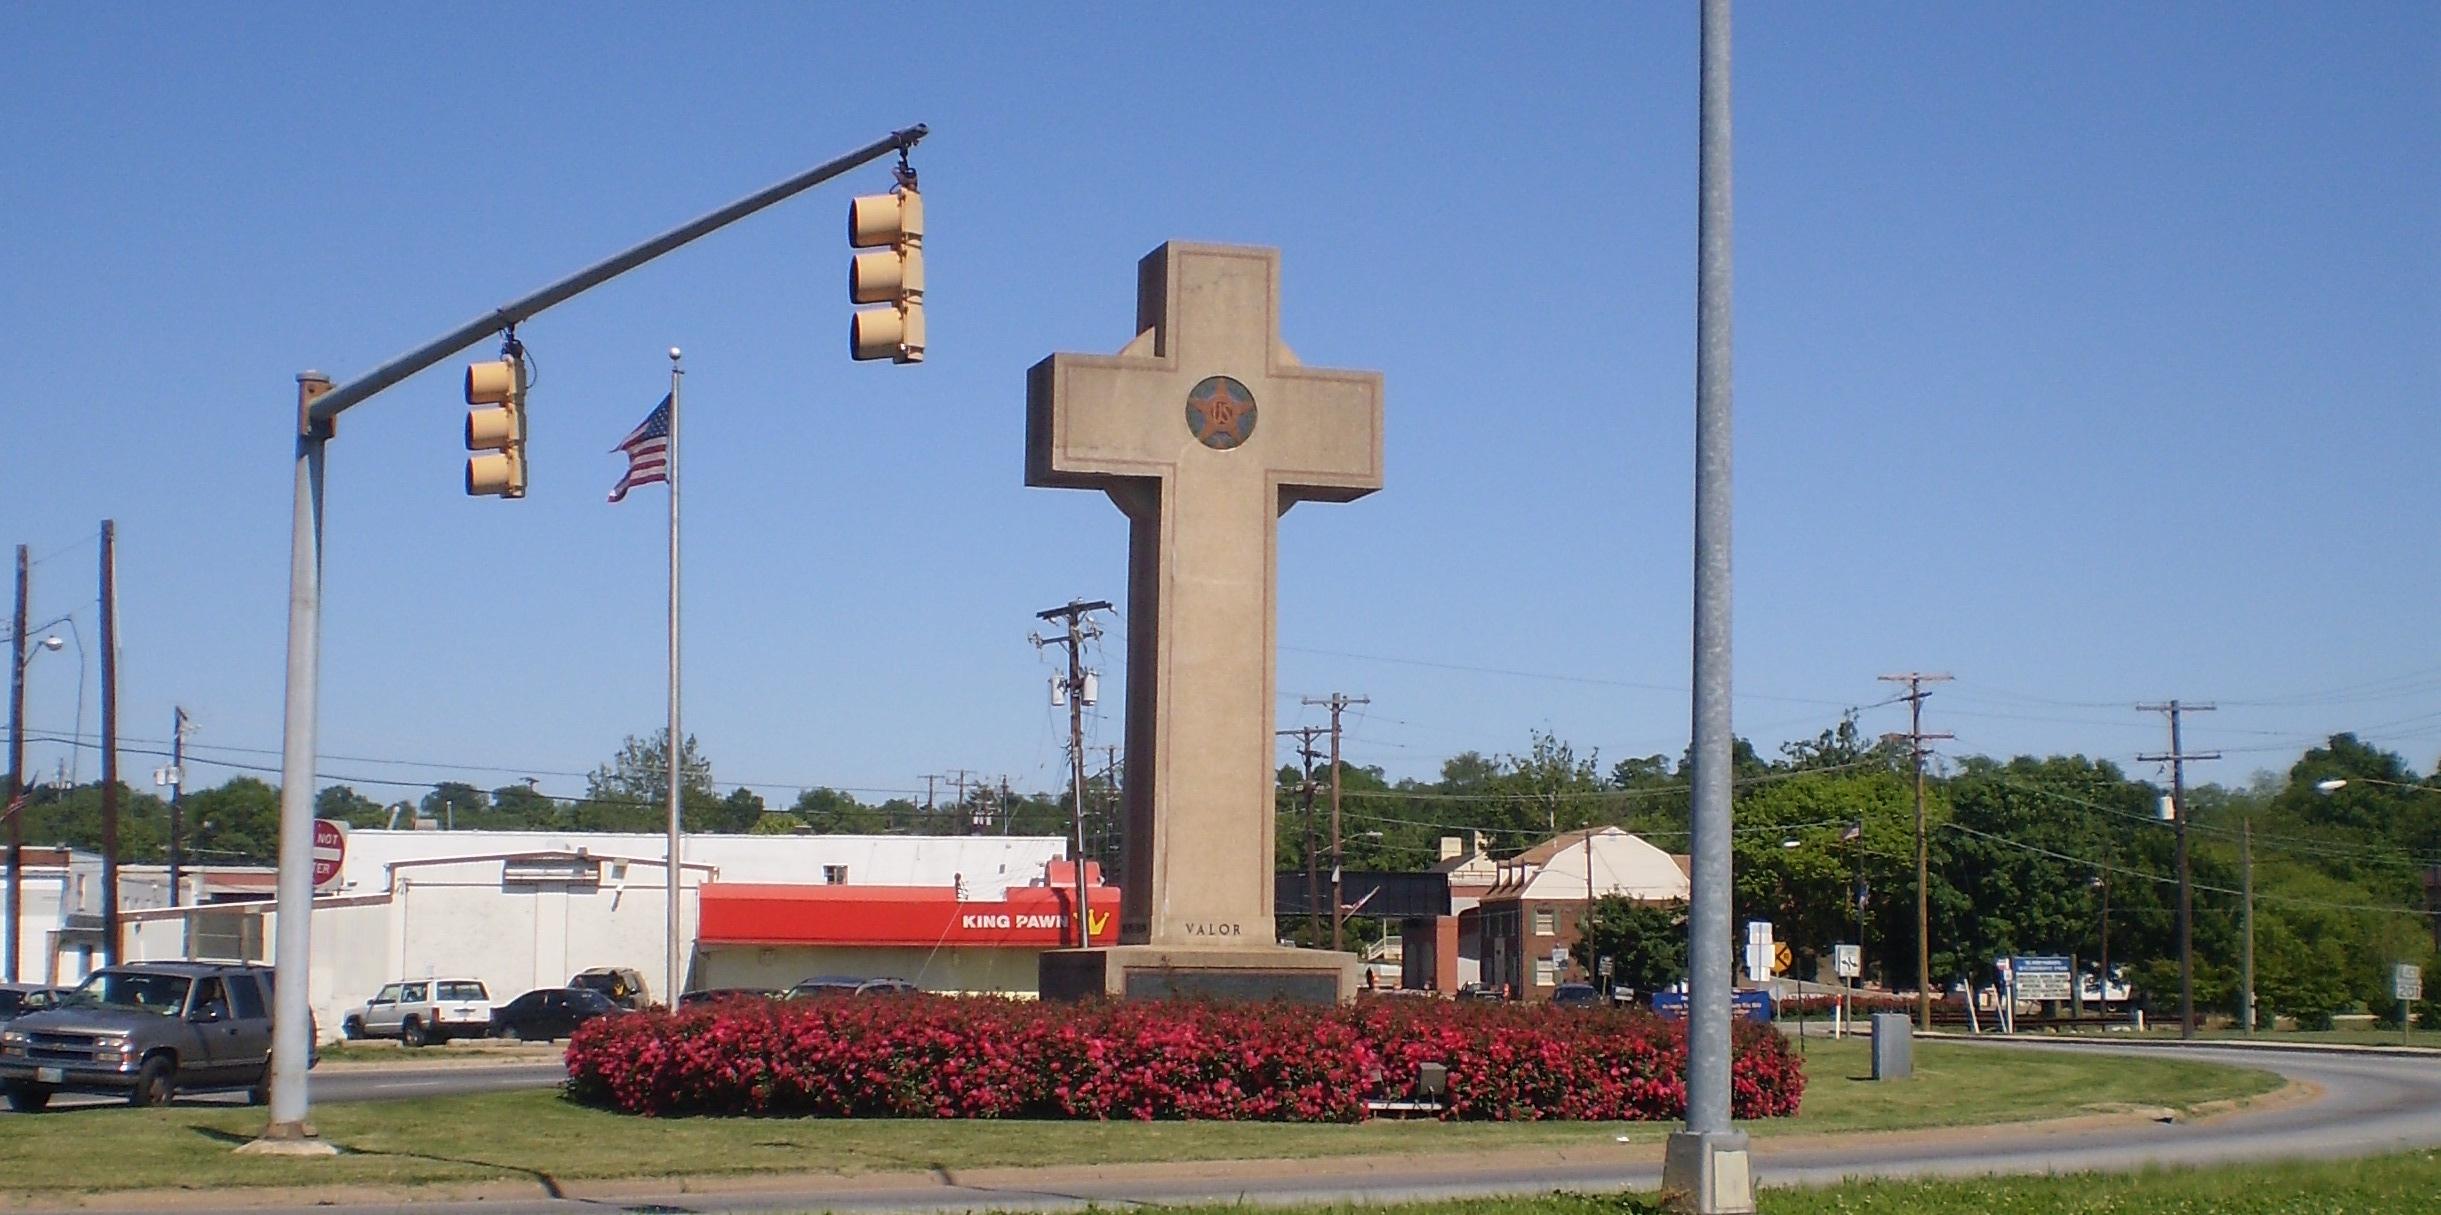 Supreme Court to decide if War Memorial Cross violates First Amendment